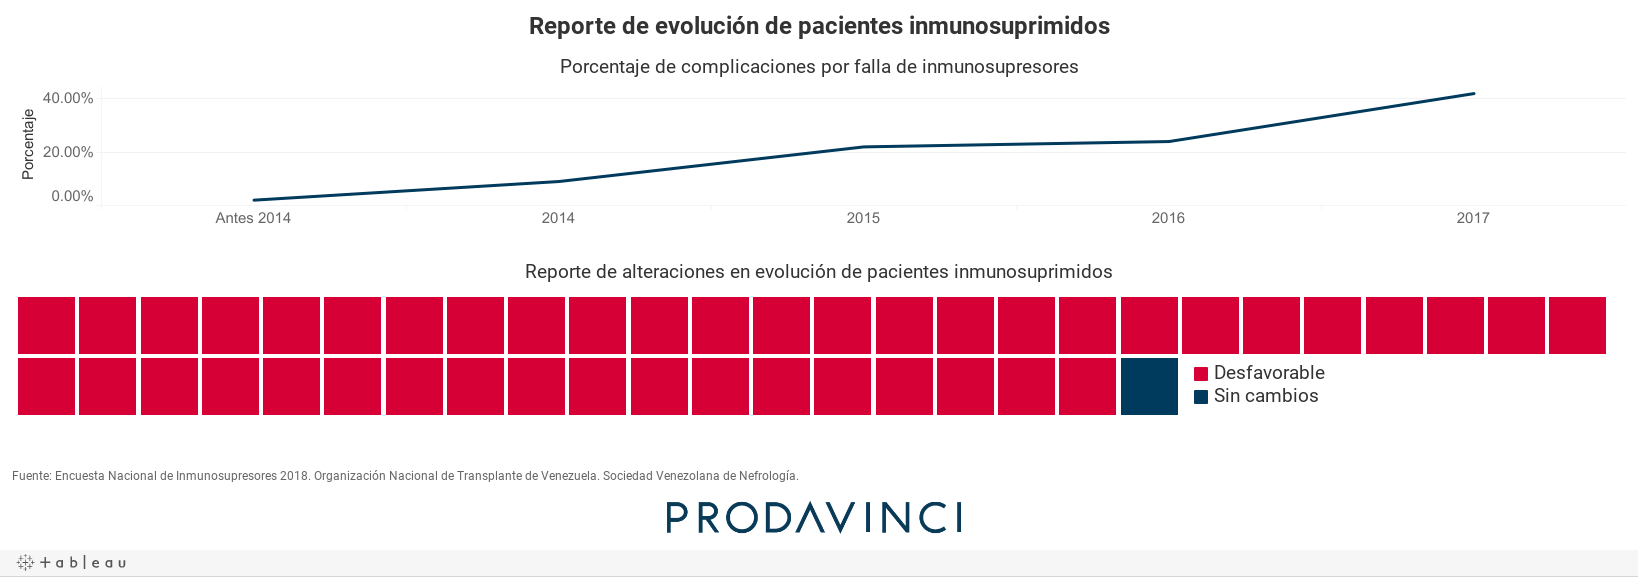 Reporte de evolución de pacientes inmunosuprimidos